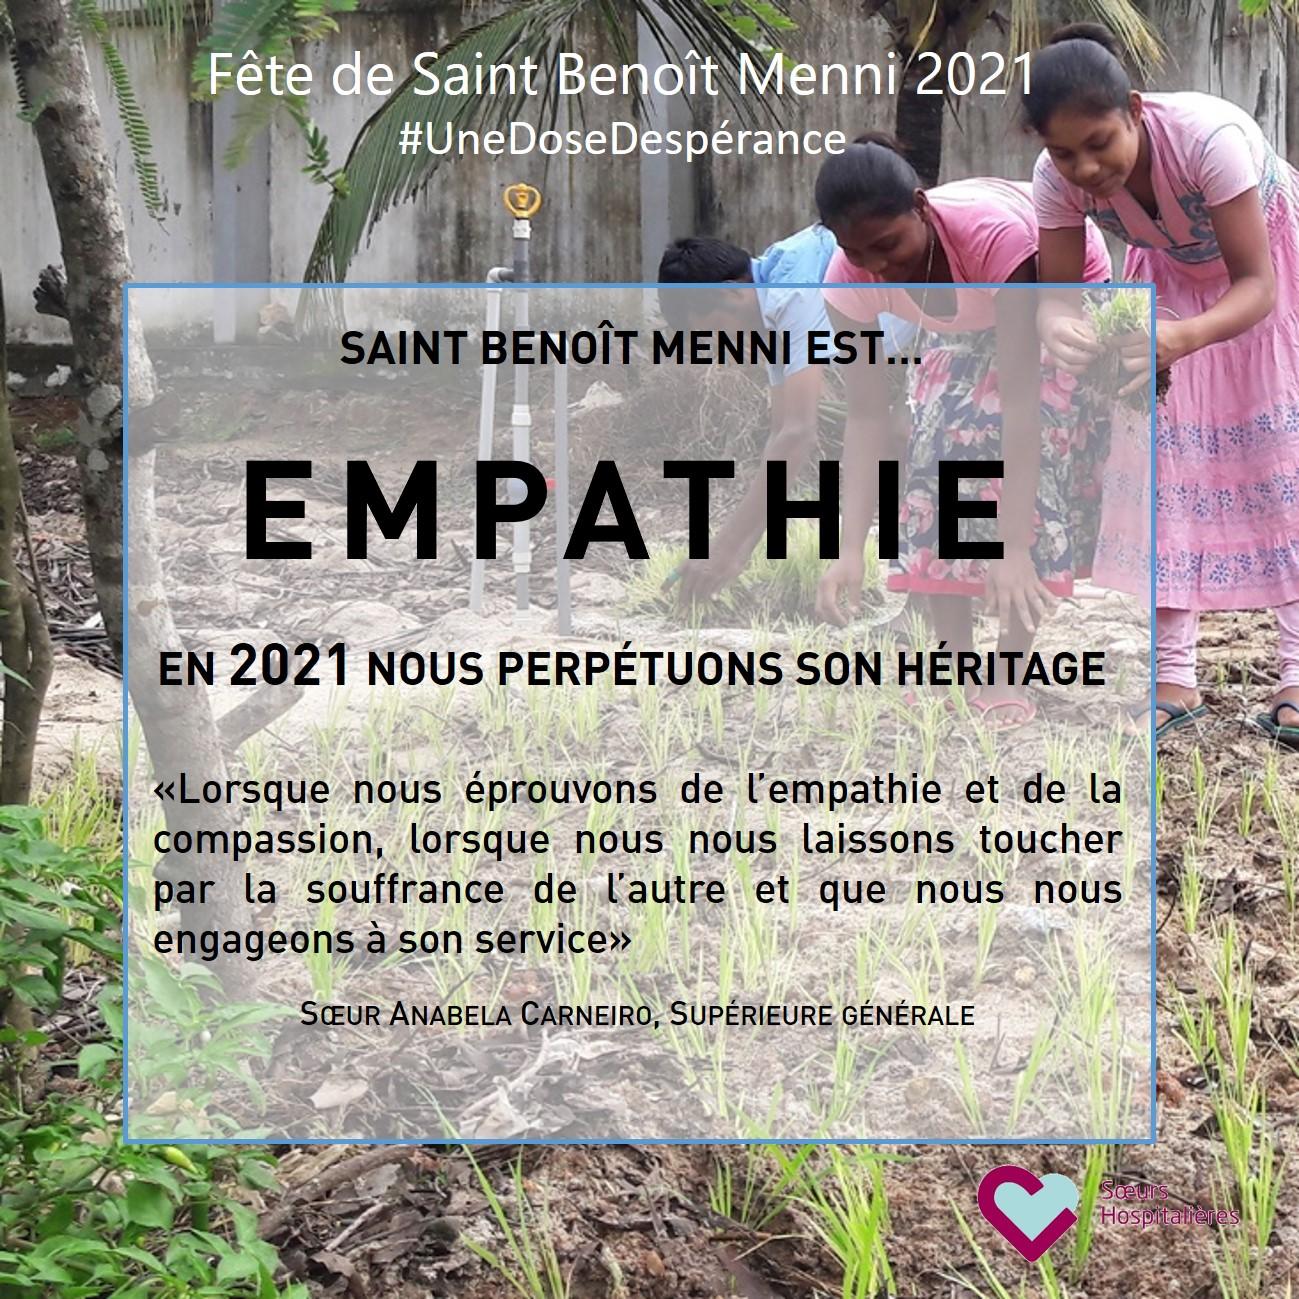 semaine-saint-benoit-menni-2021-2